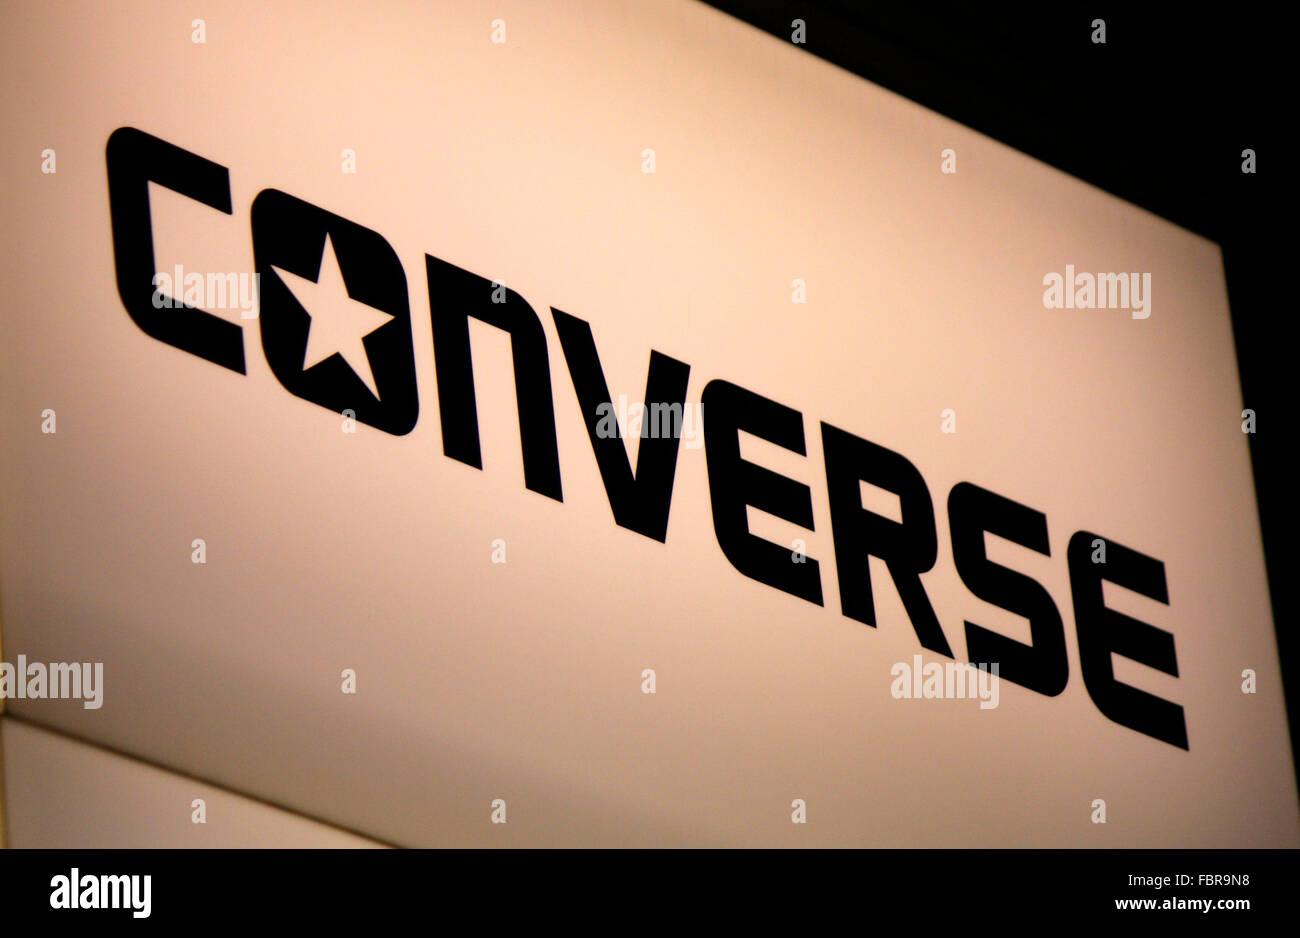 Markenname: 'Converse', Berlin. - Stock Image